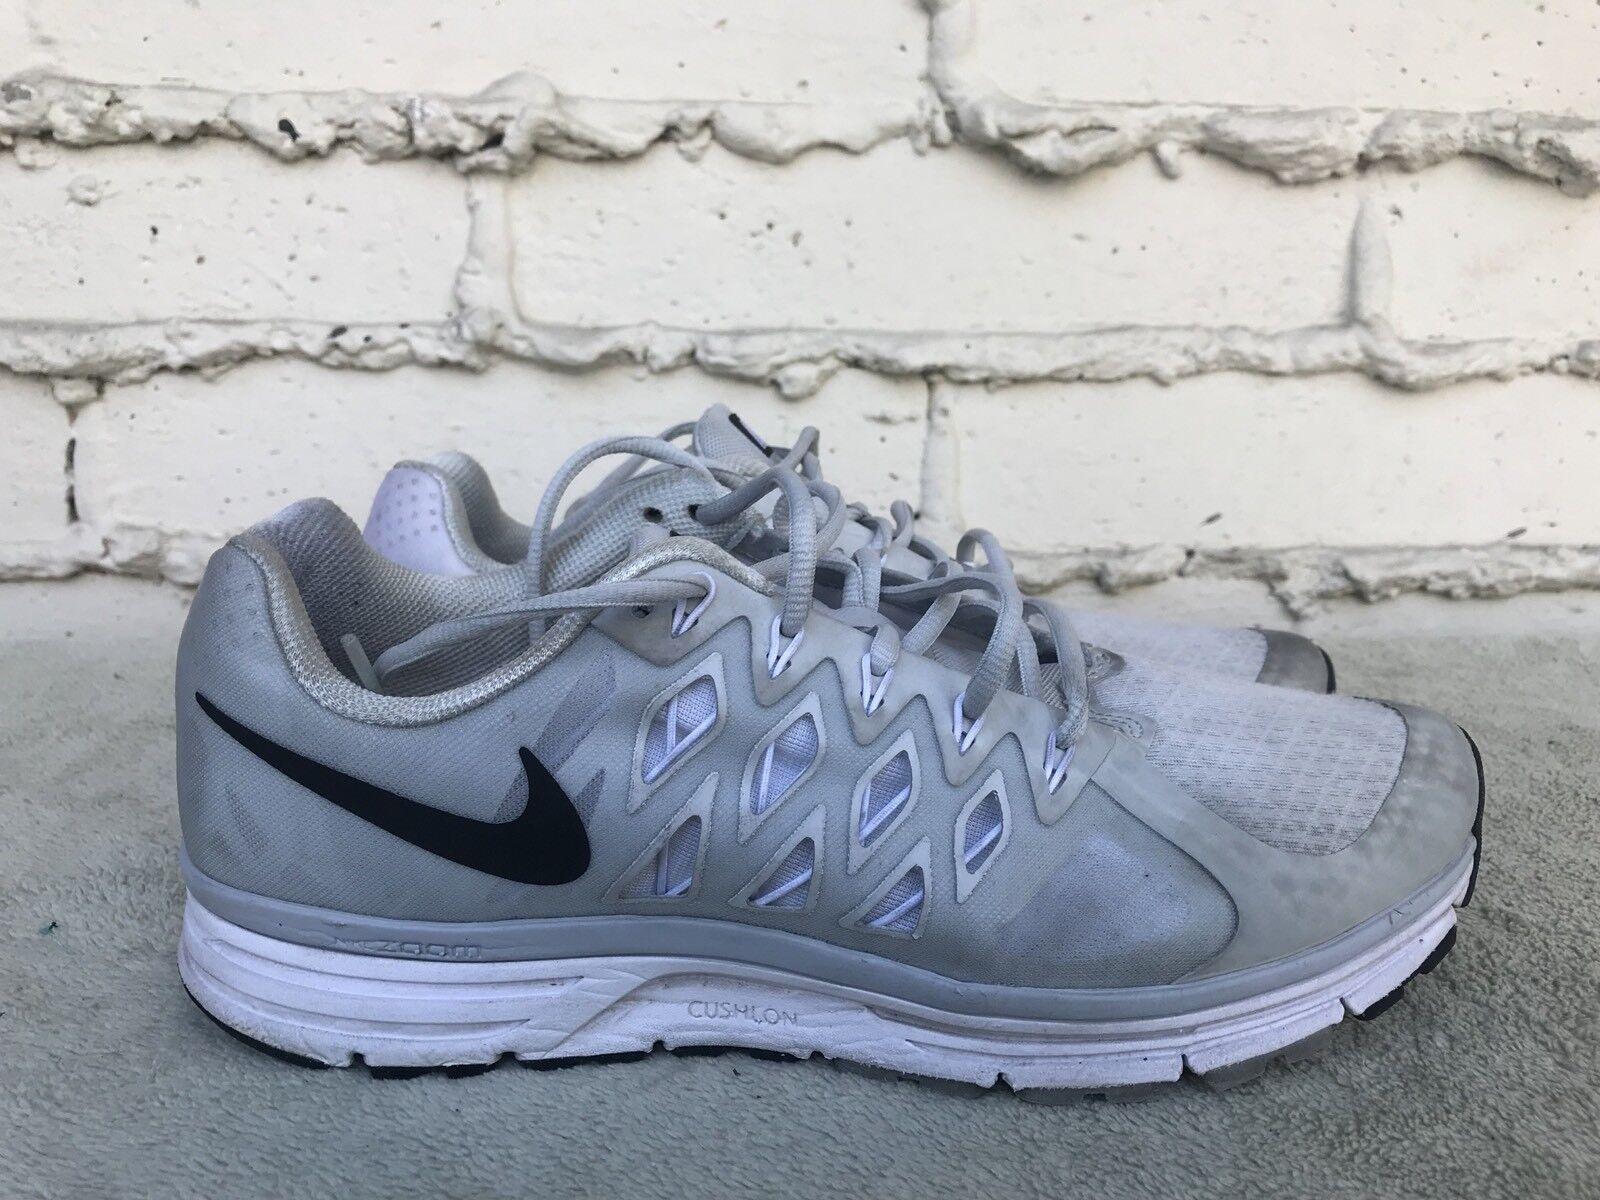 Nike Zoom Vomero 9 Team Training Shoes Platinum-Black/White 659373-002 US 10